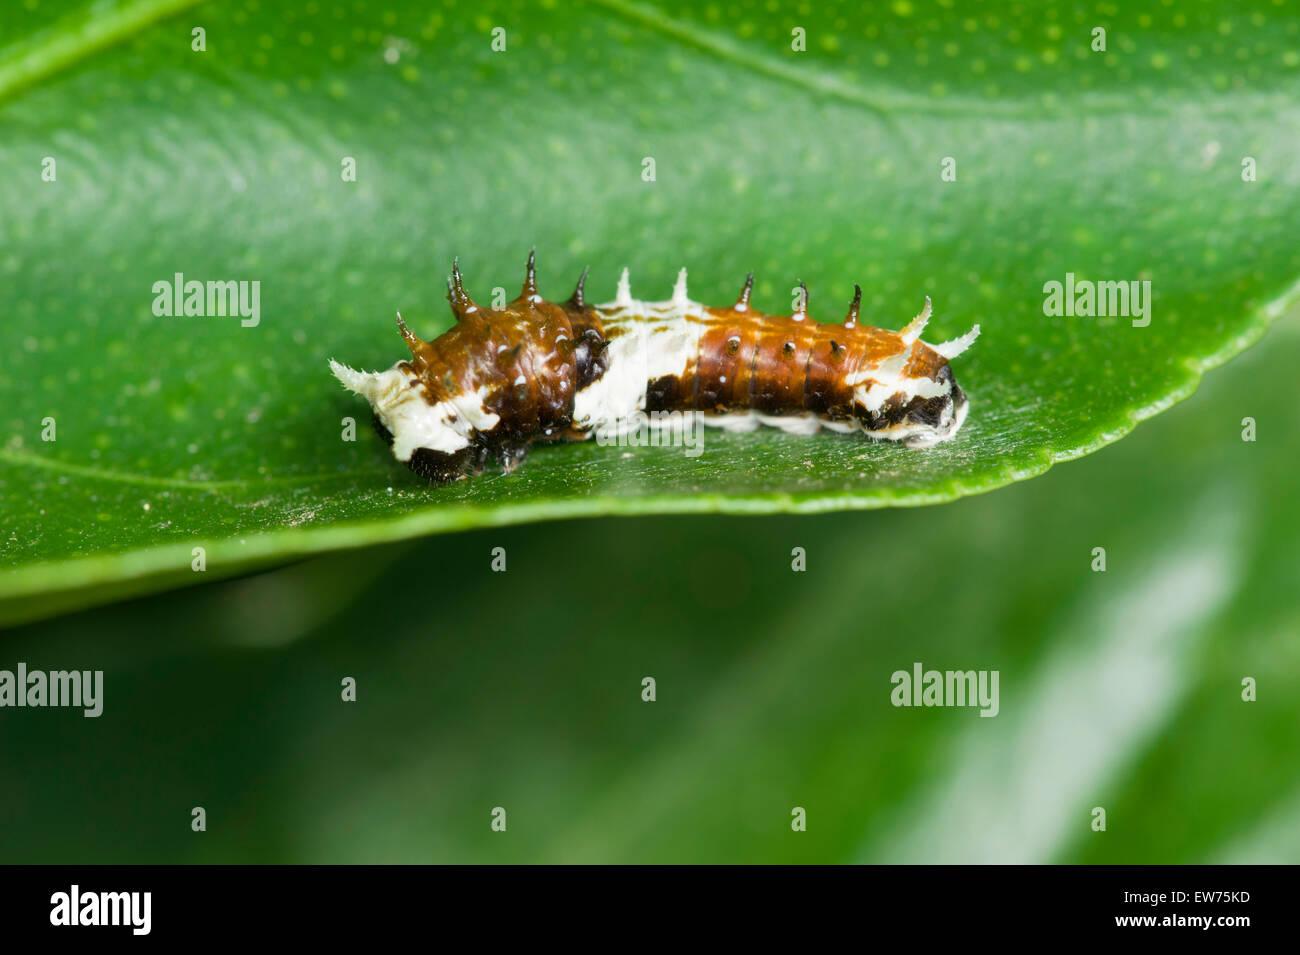 Orchard swallowtail caterpillar resembling bird dropping - Stock Image